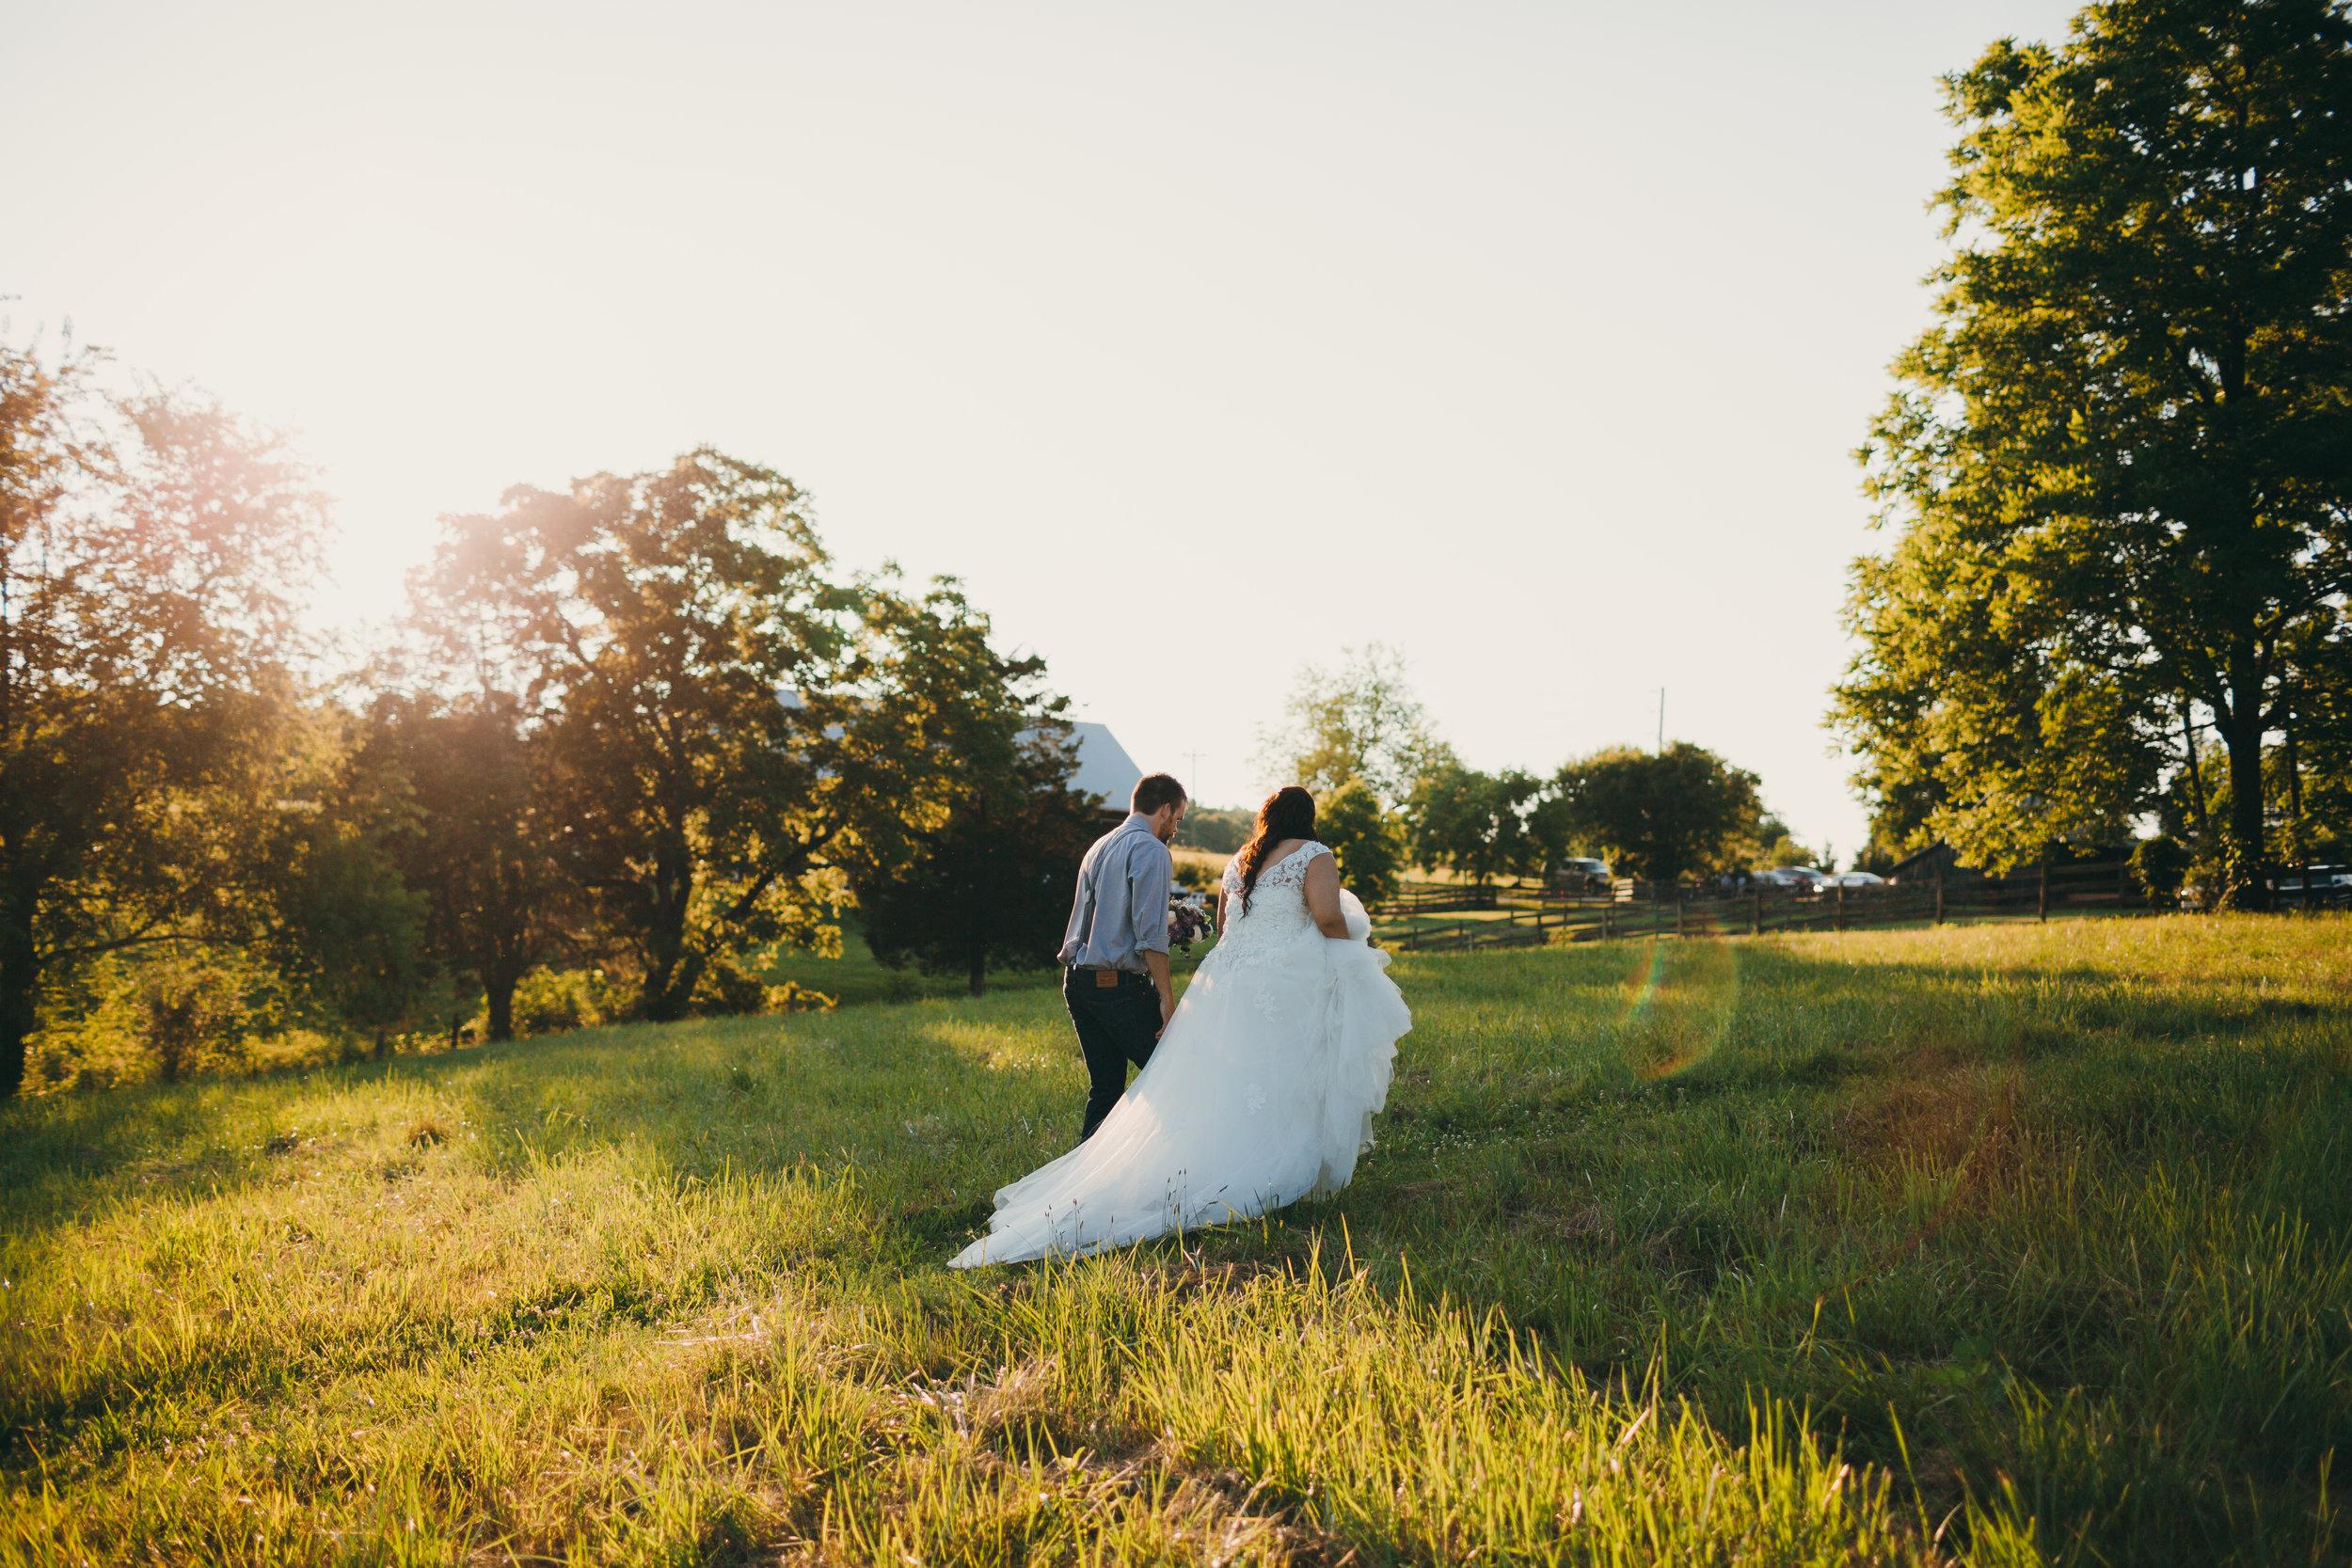 Sorella Farms_Lynchburg Wedding Photographer_Lynchburg Wedding Venue_Lynchburg Photographer-33.jpg